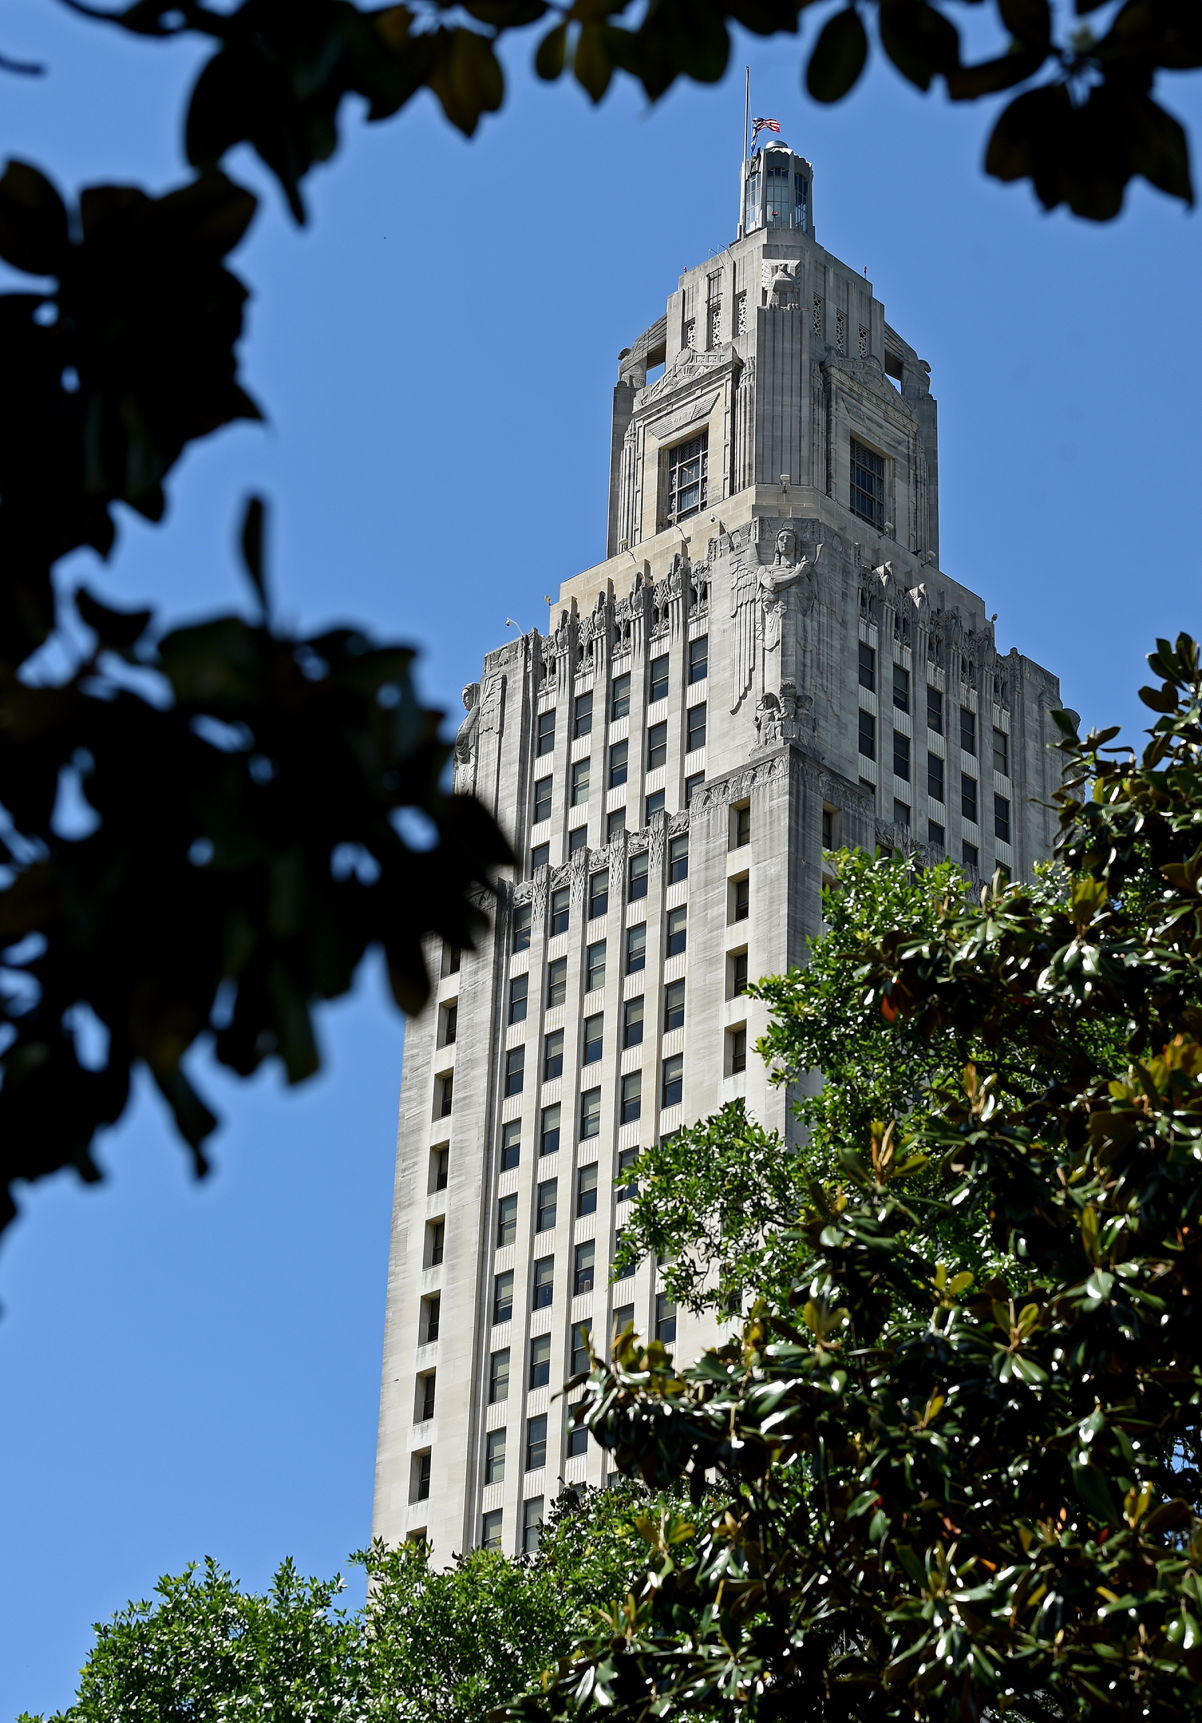 Lawsuit challenges Louisiana Bond Commission's decision to block banks over gun policies